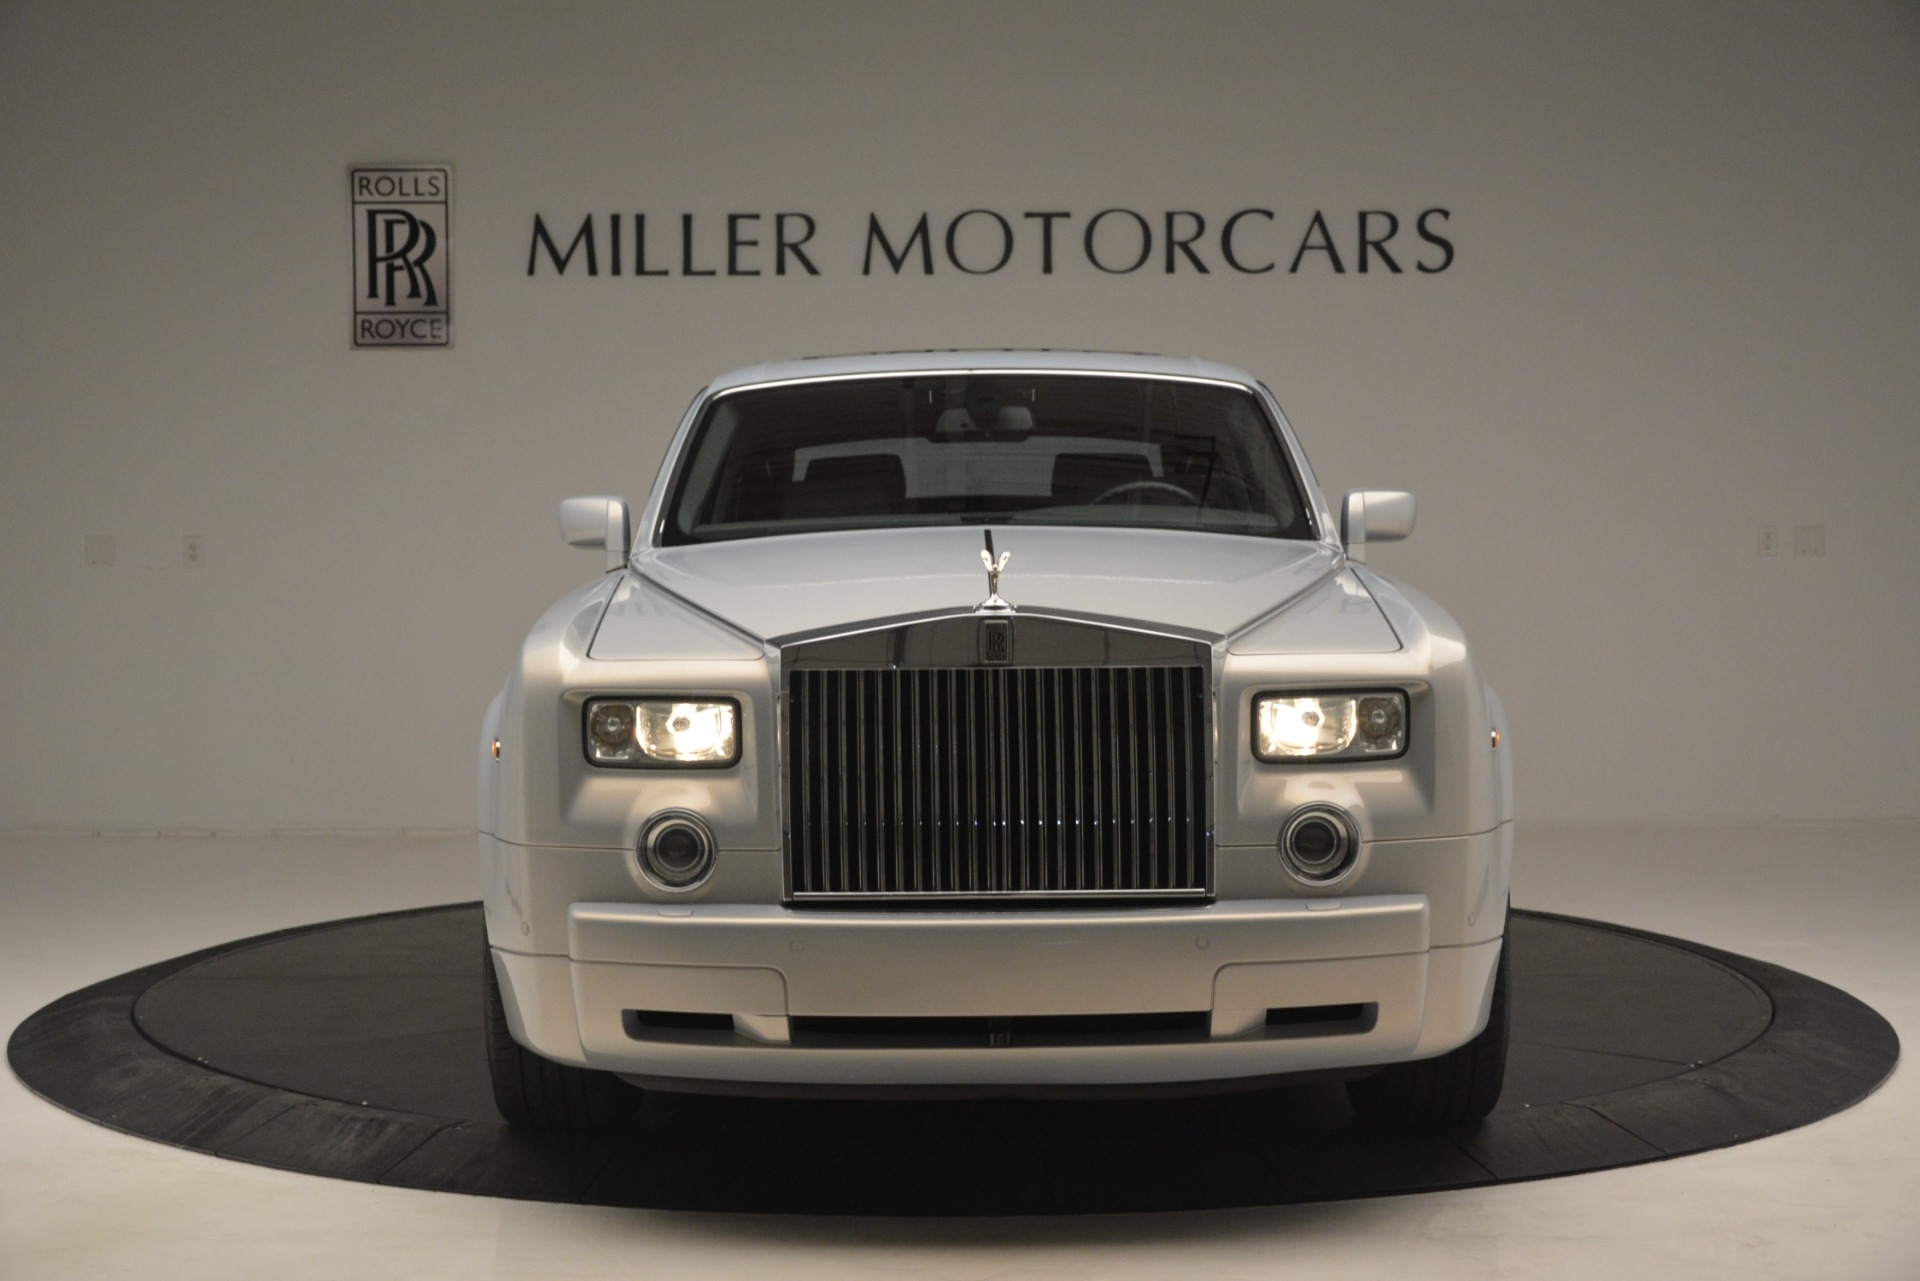 Used 2007 Rolls-Royce Phantom  For Sale In Greenwich, CT. Alfa Romeo of Greenwich, R483A 3089_p2